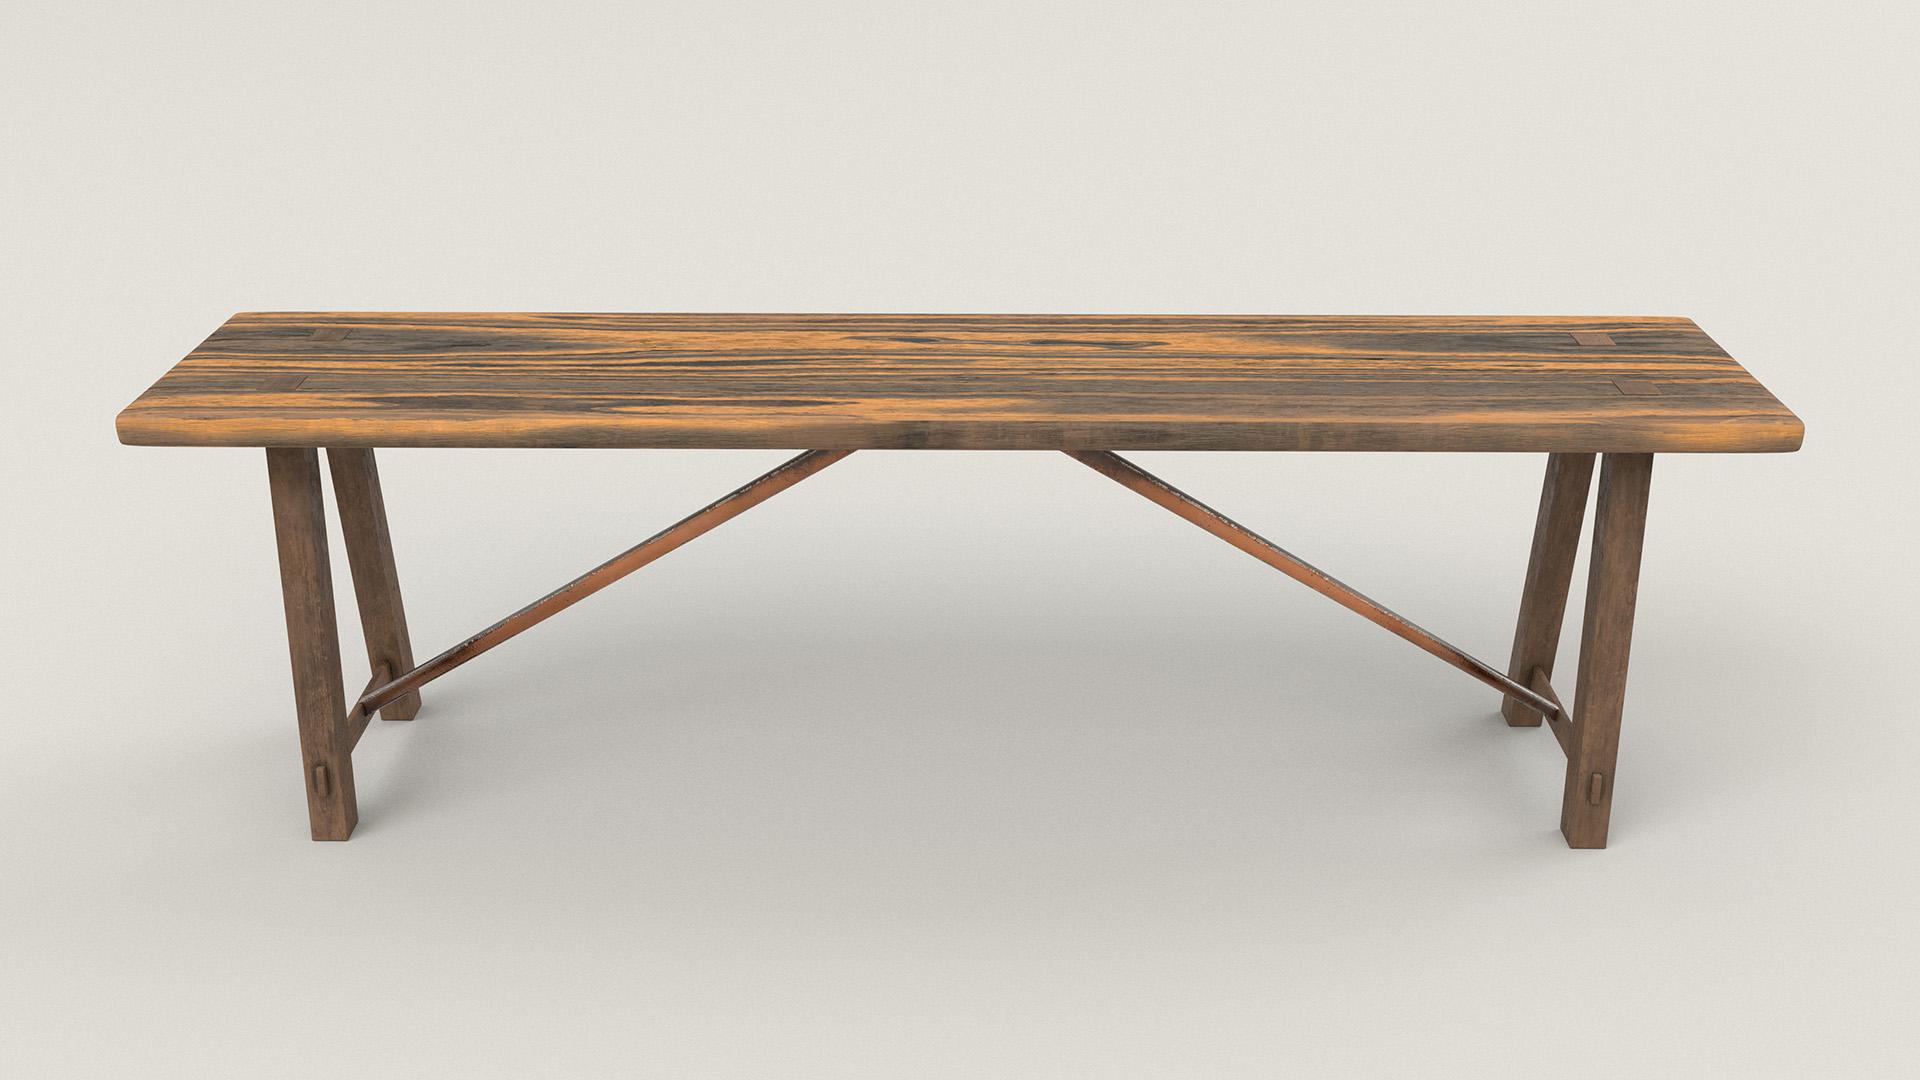 Figure 15: Bench with dark wood legs, metal diagonal braces, and lighter wood top.